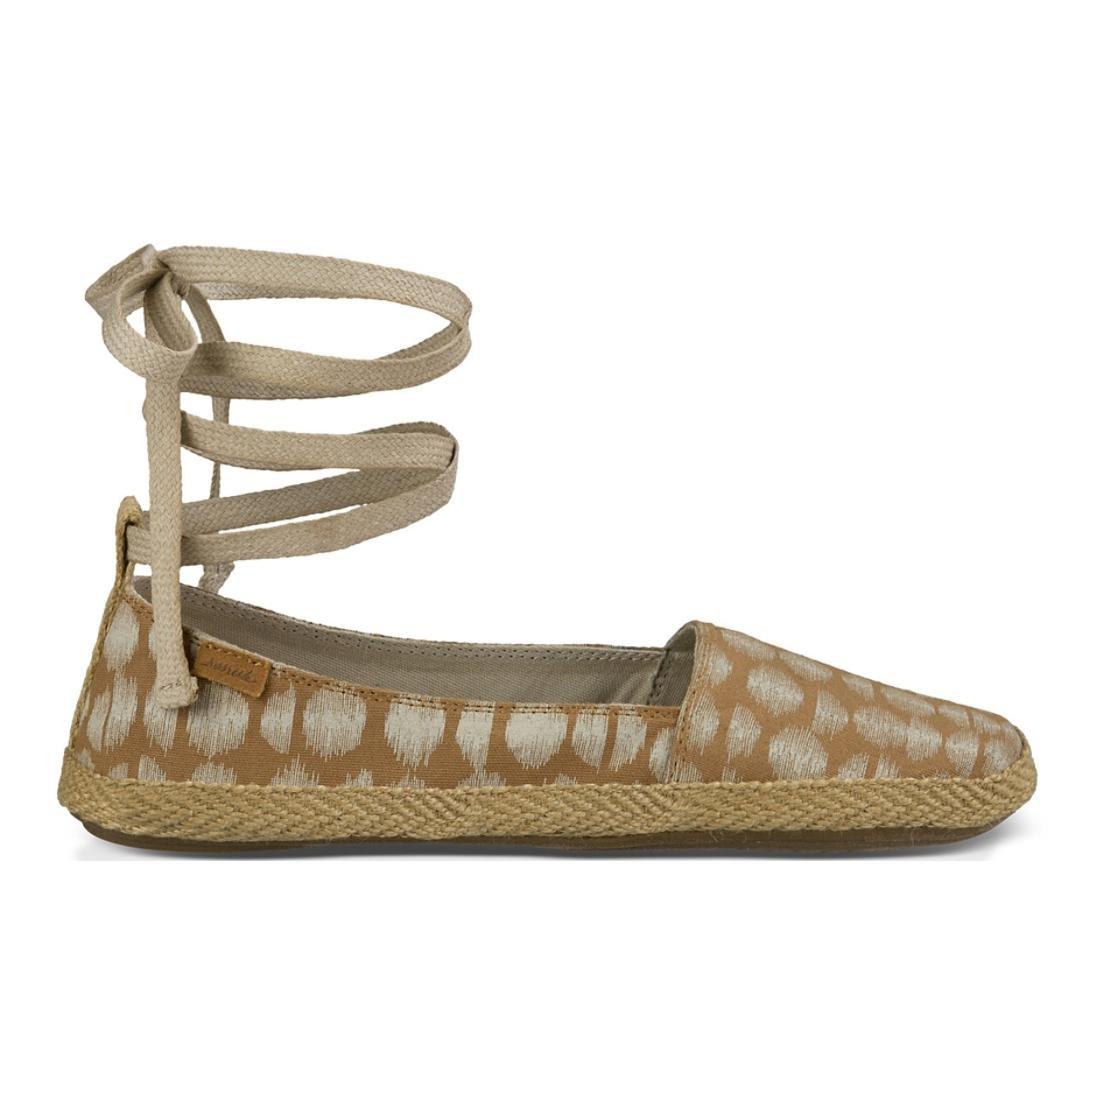 Sanuk Womens Espie Slip On LX Shoes Footwear B01IAP778E 6.5 B(M) US Tobacco/Natural Ikat